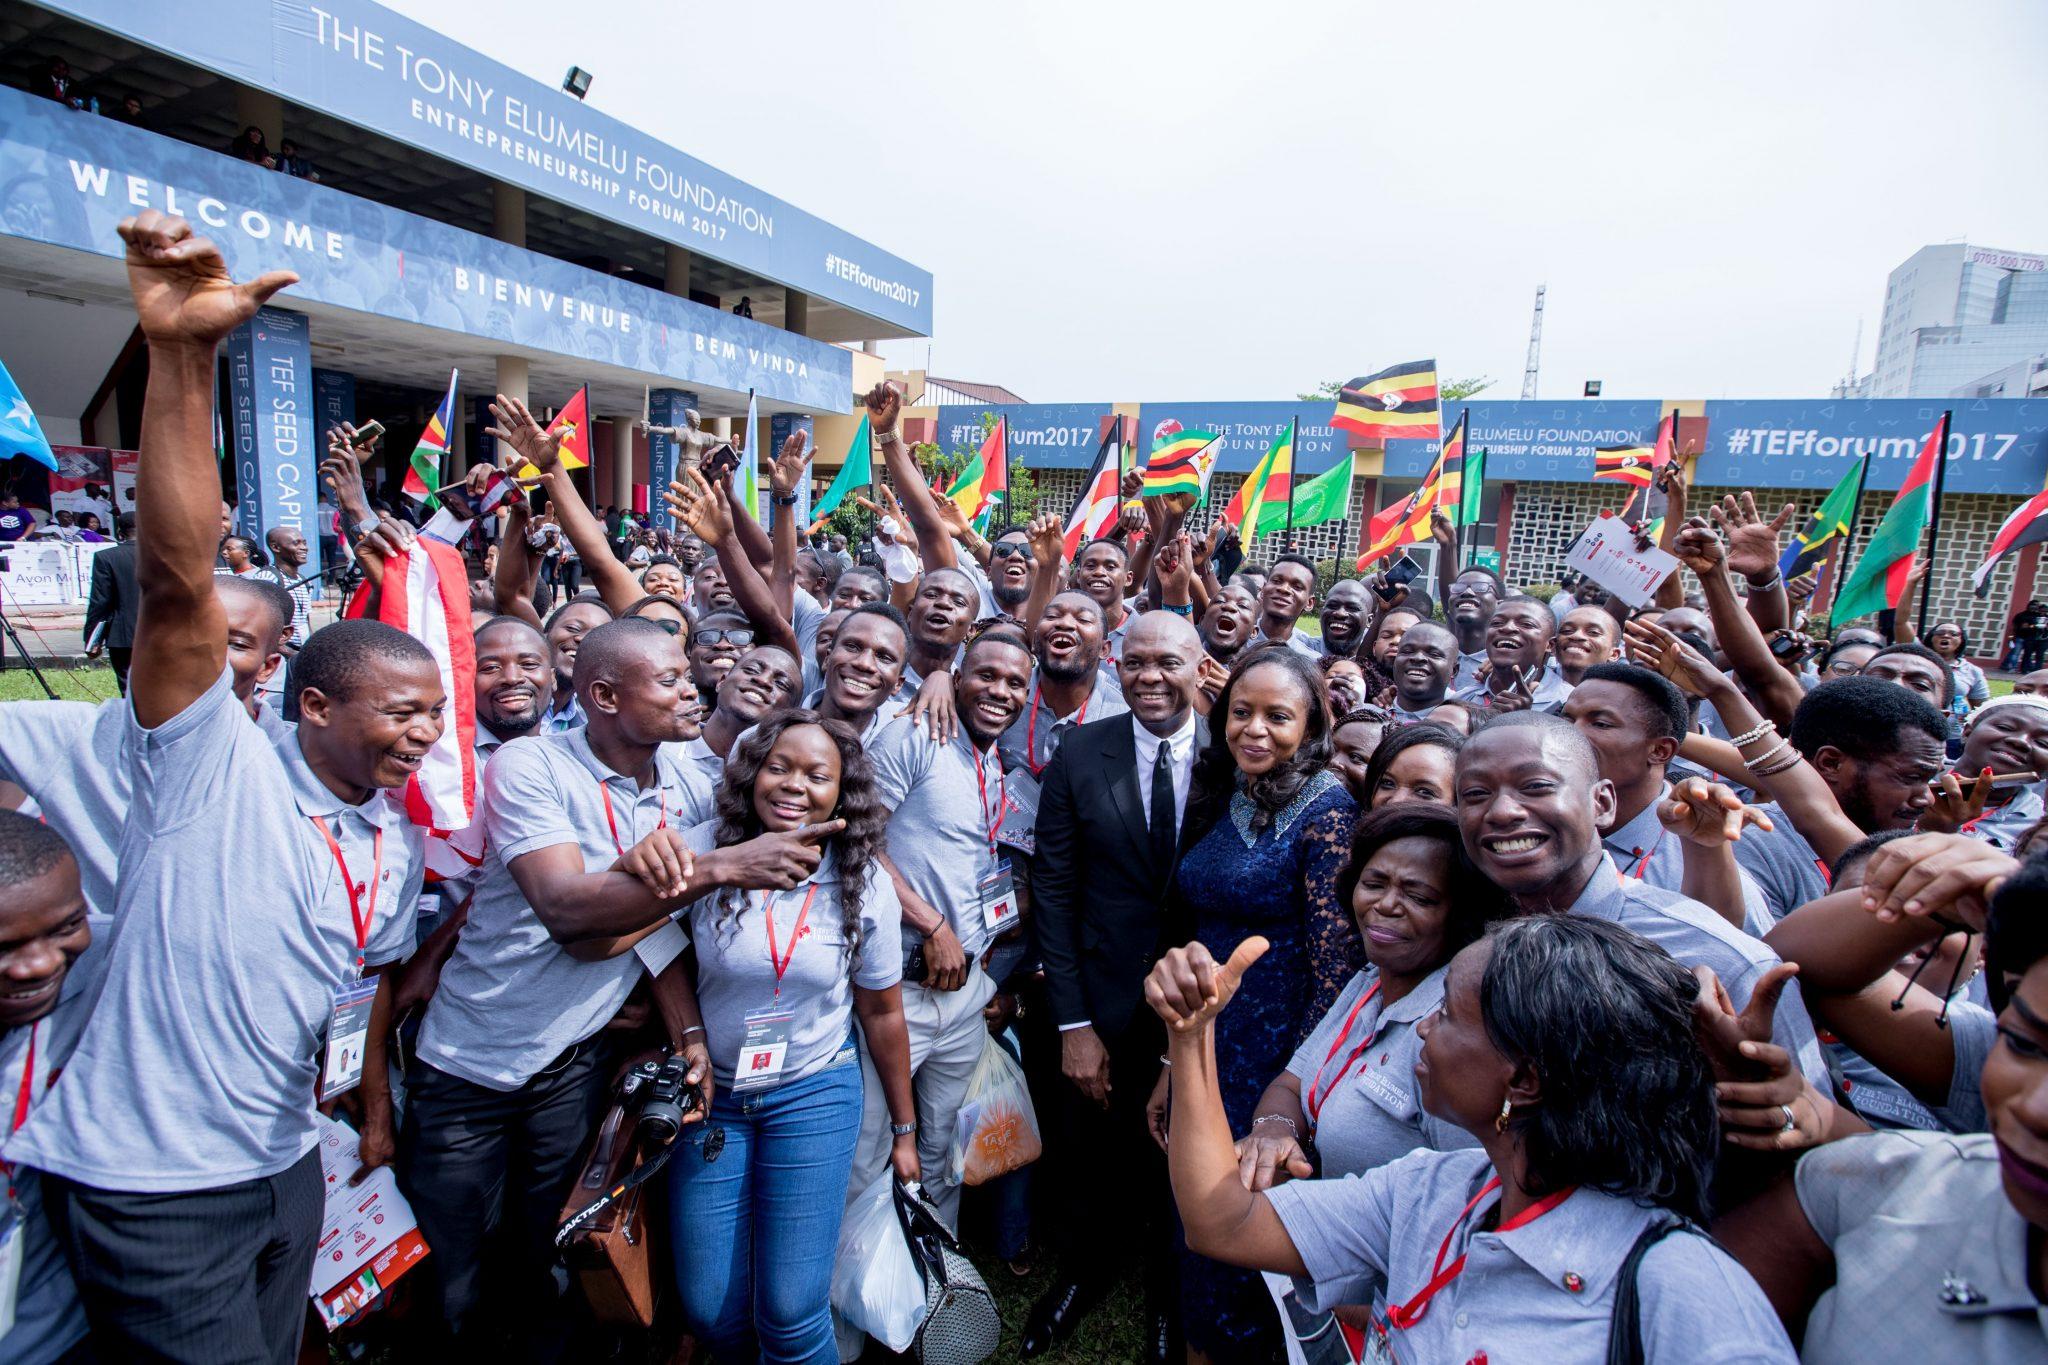 Tony Elumelu Foundation Entrepreneurship Program (TEEP) Across Africa in 2021